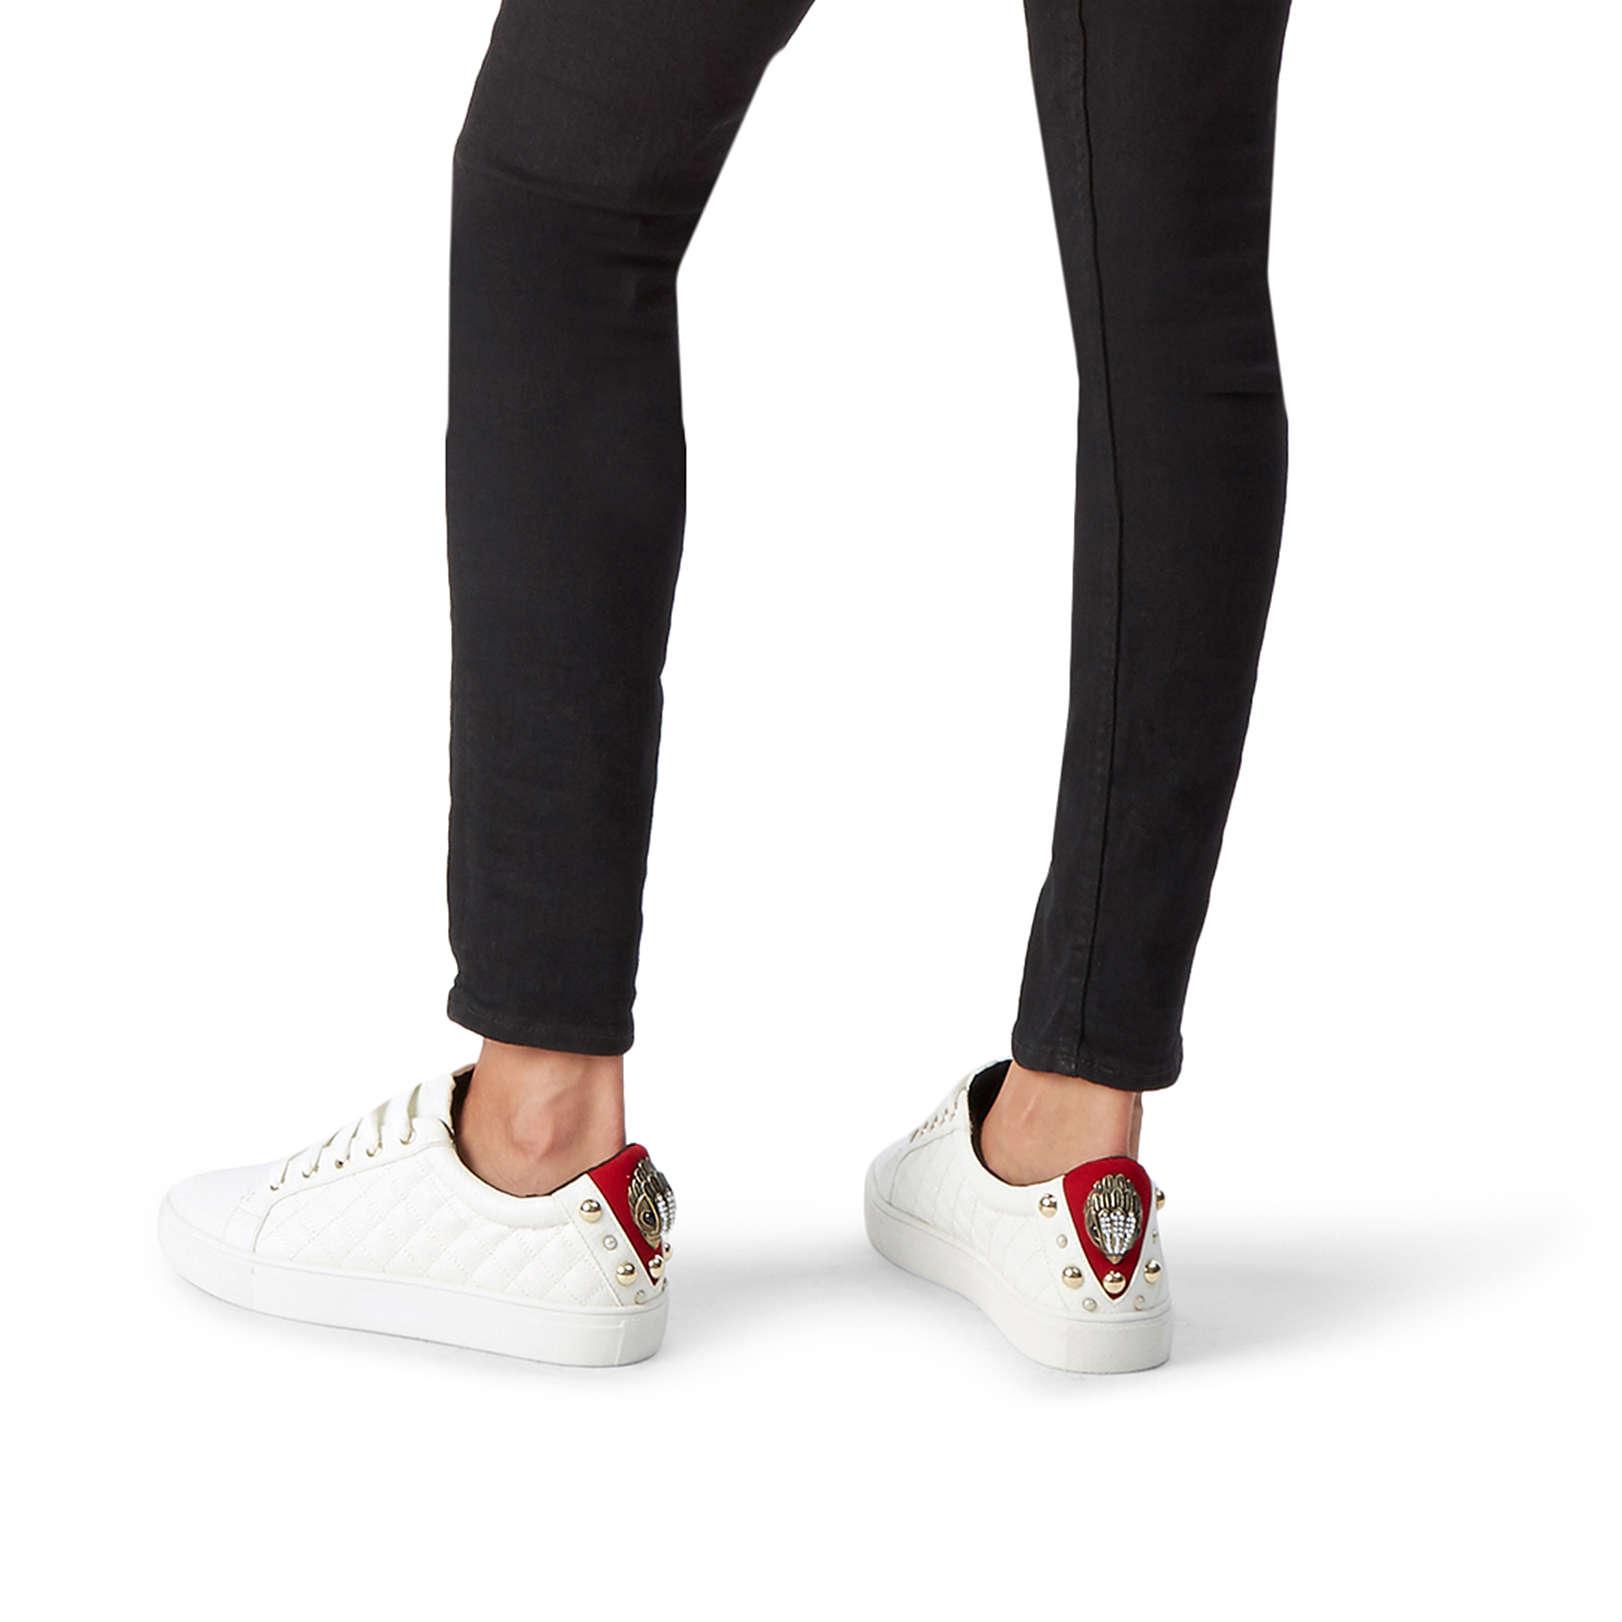 LUDO - KURT GEIGER LONDON Sneakers